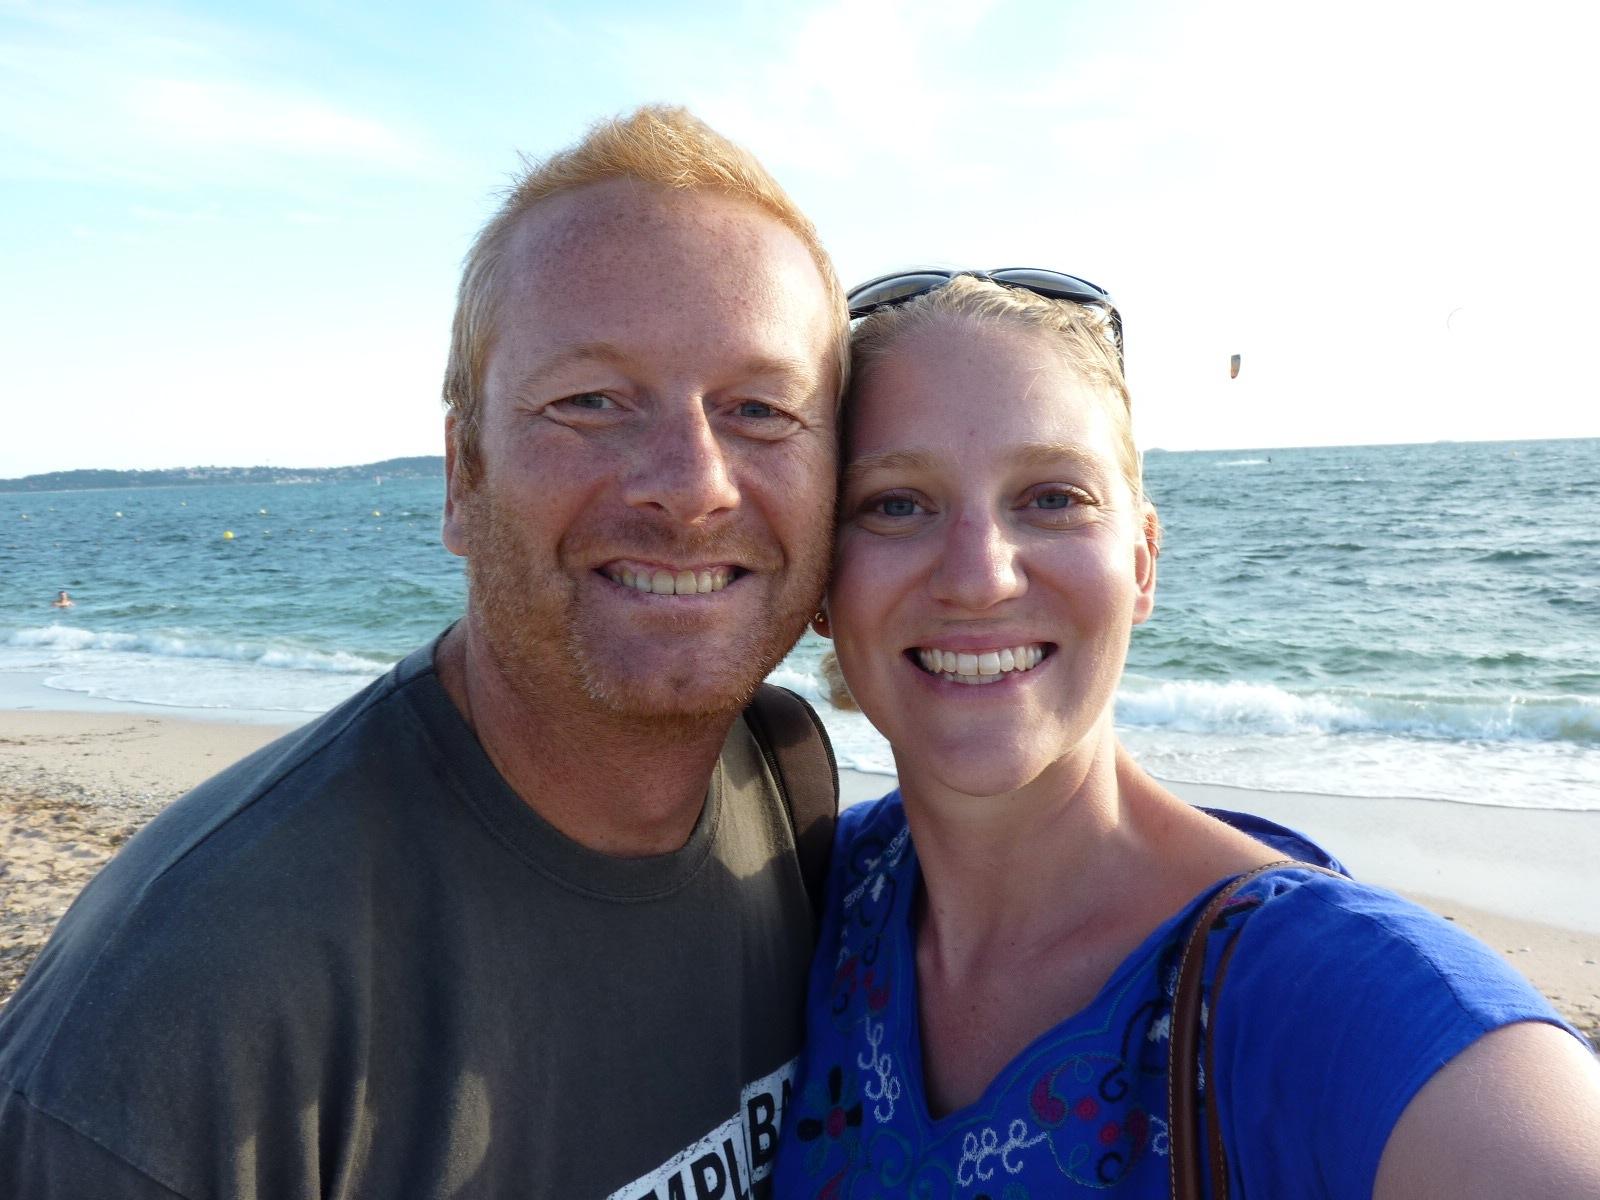 Jess-Olivier-at-the-Beach.jpg